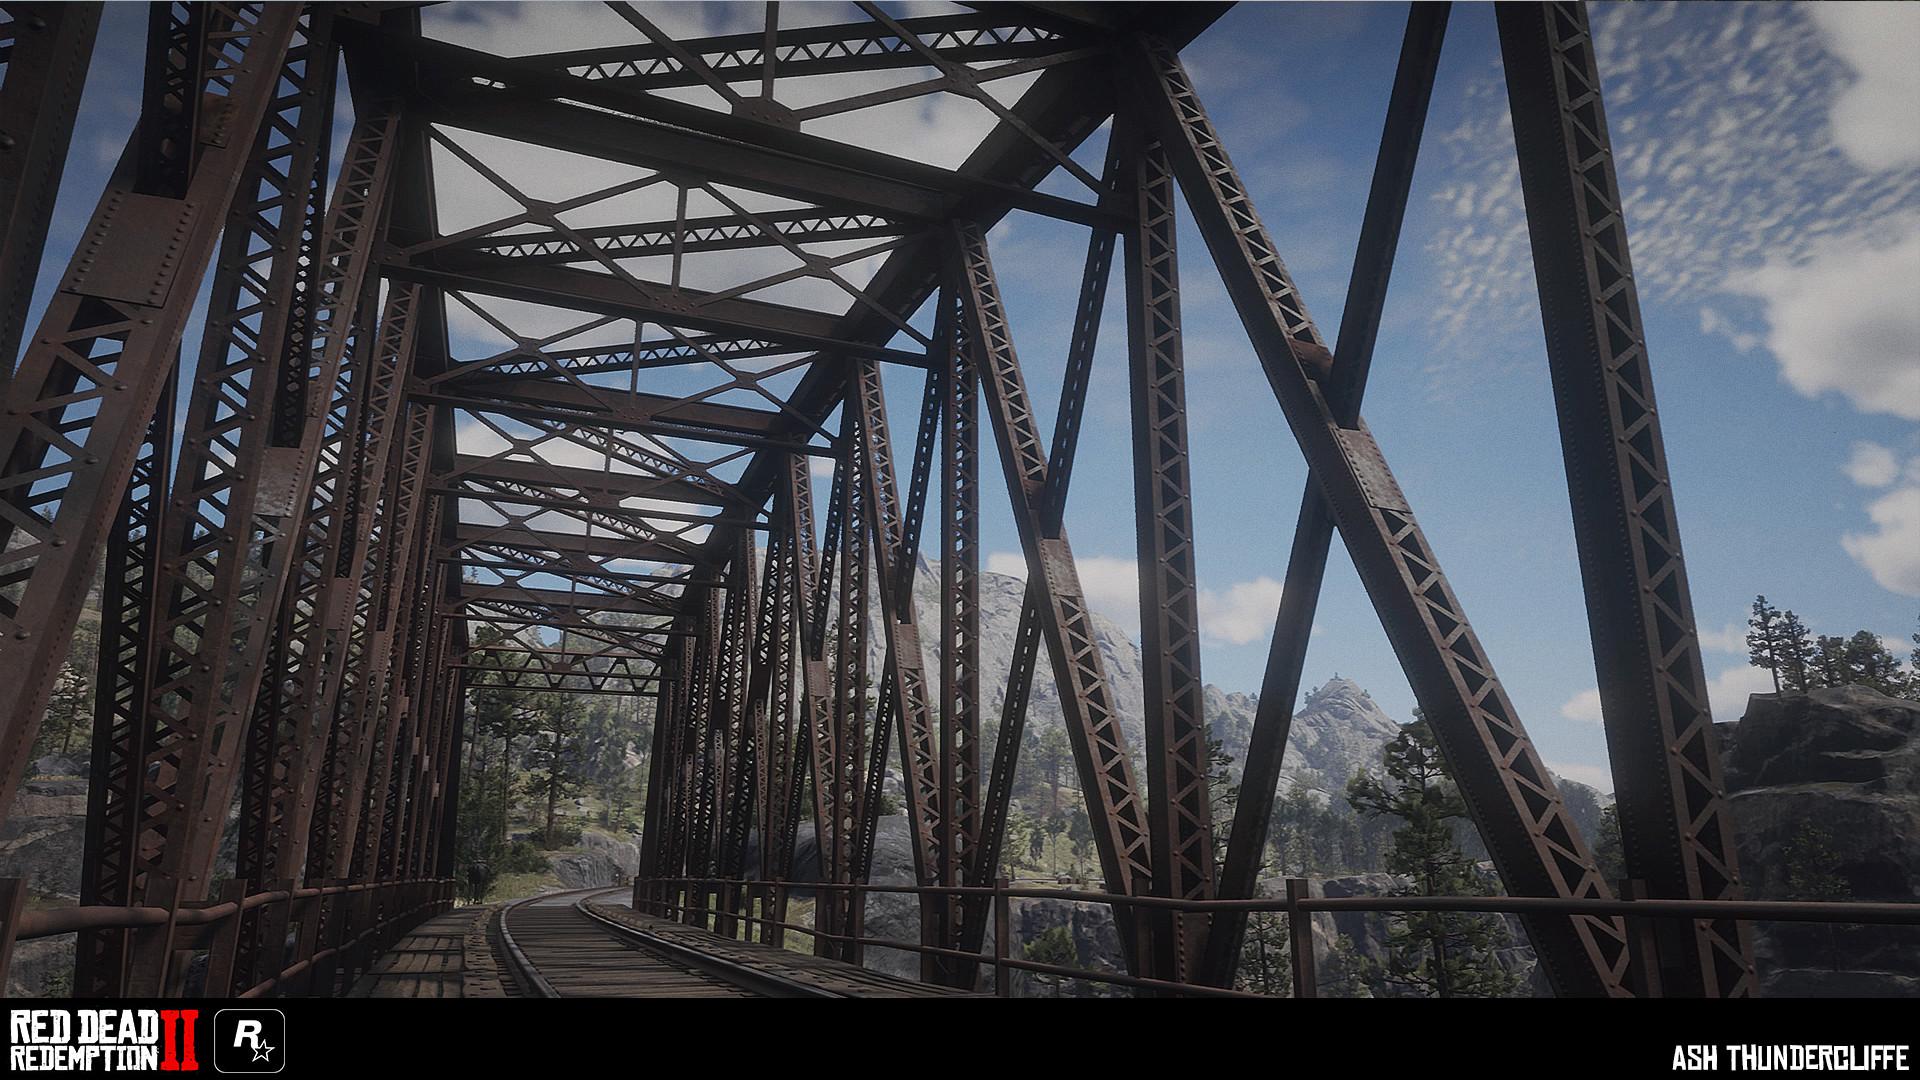 Ash thundercliffe bigl truss 1